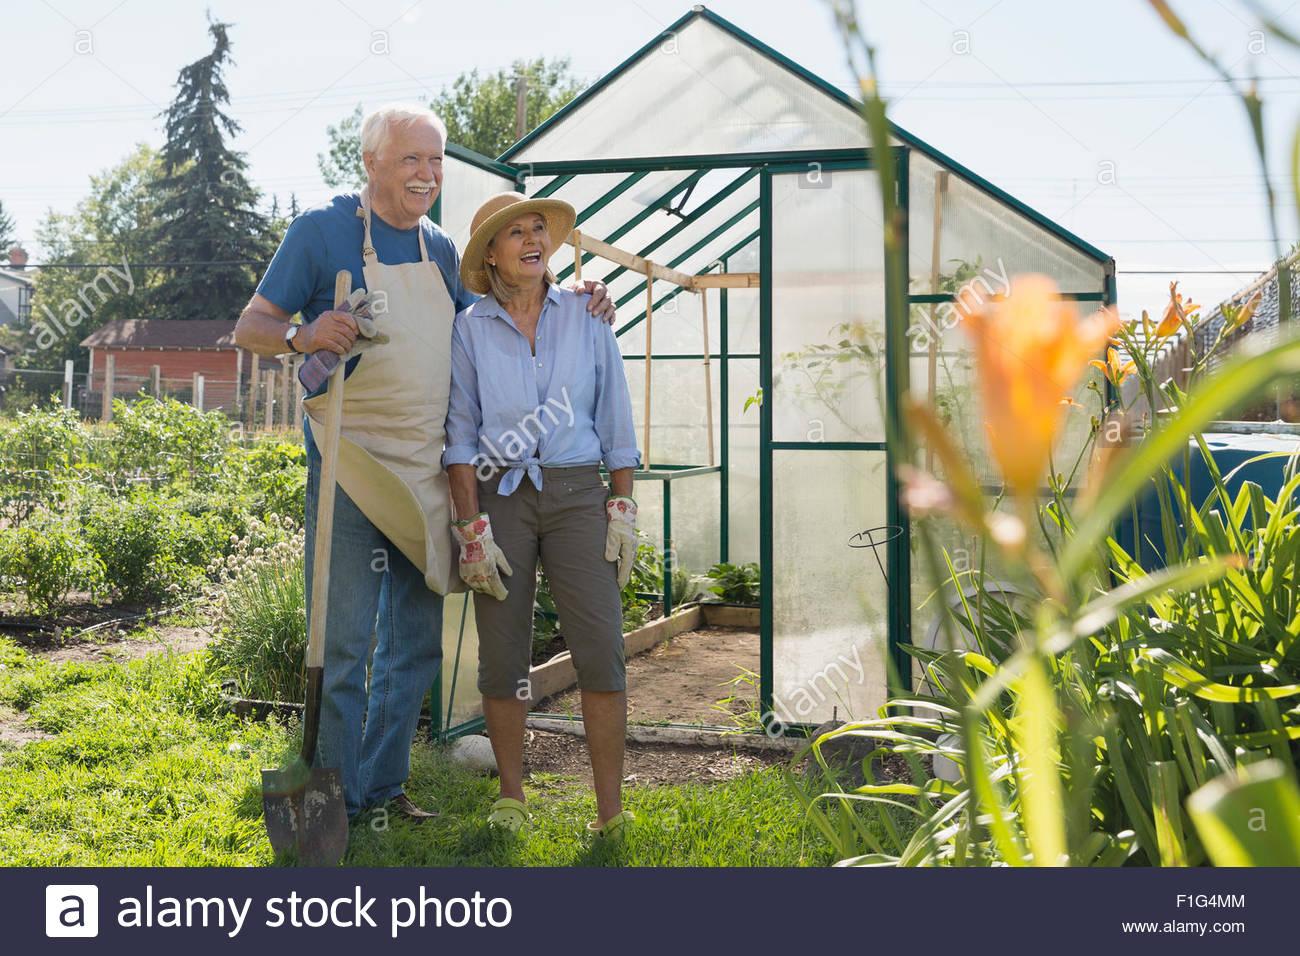 Senior couple with shovel at garden greenhouse - Stock Image